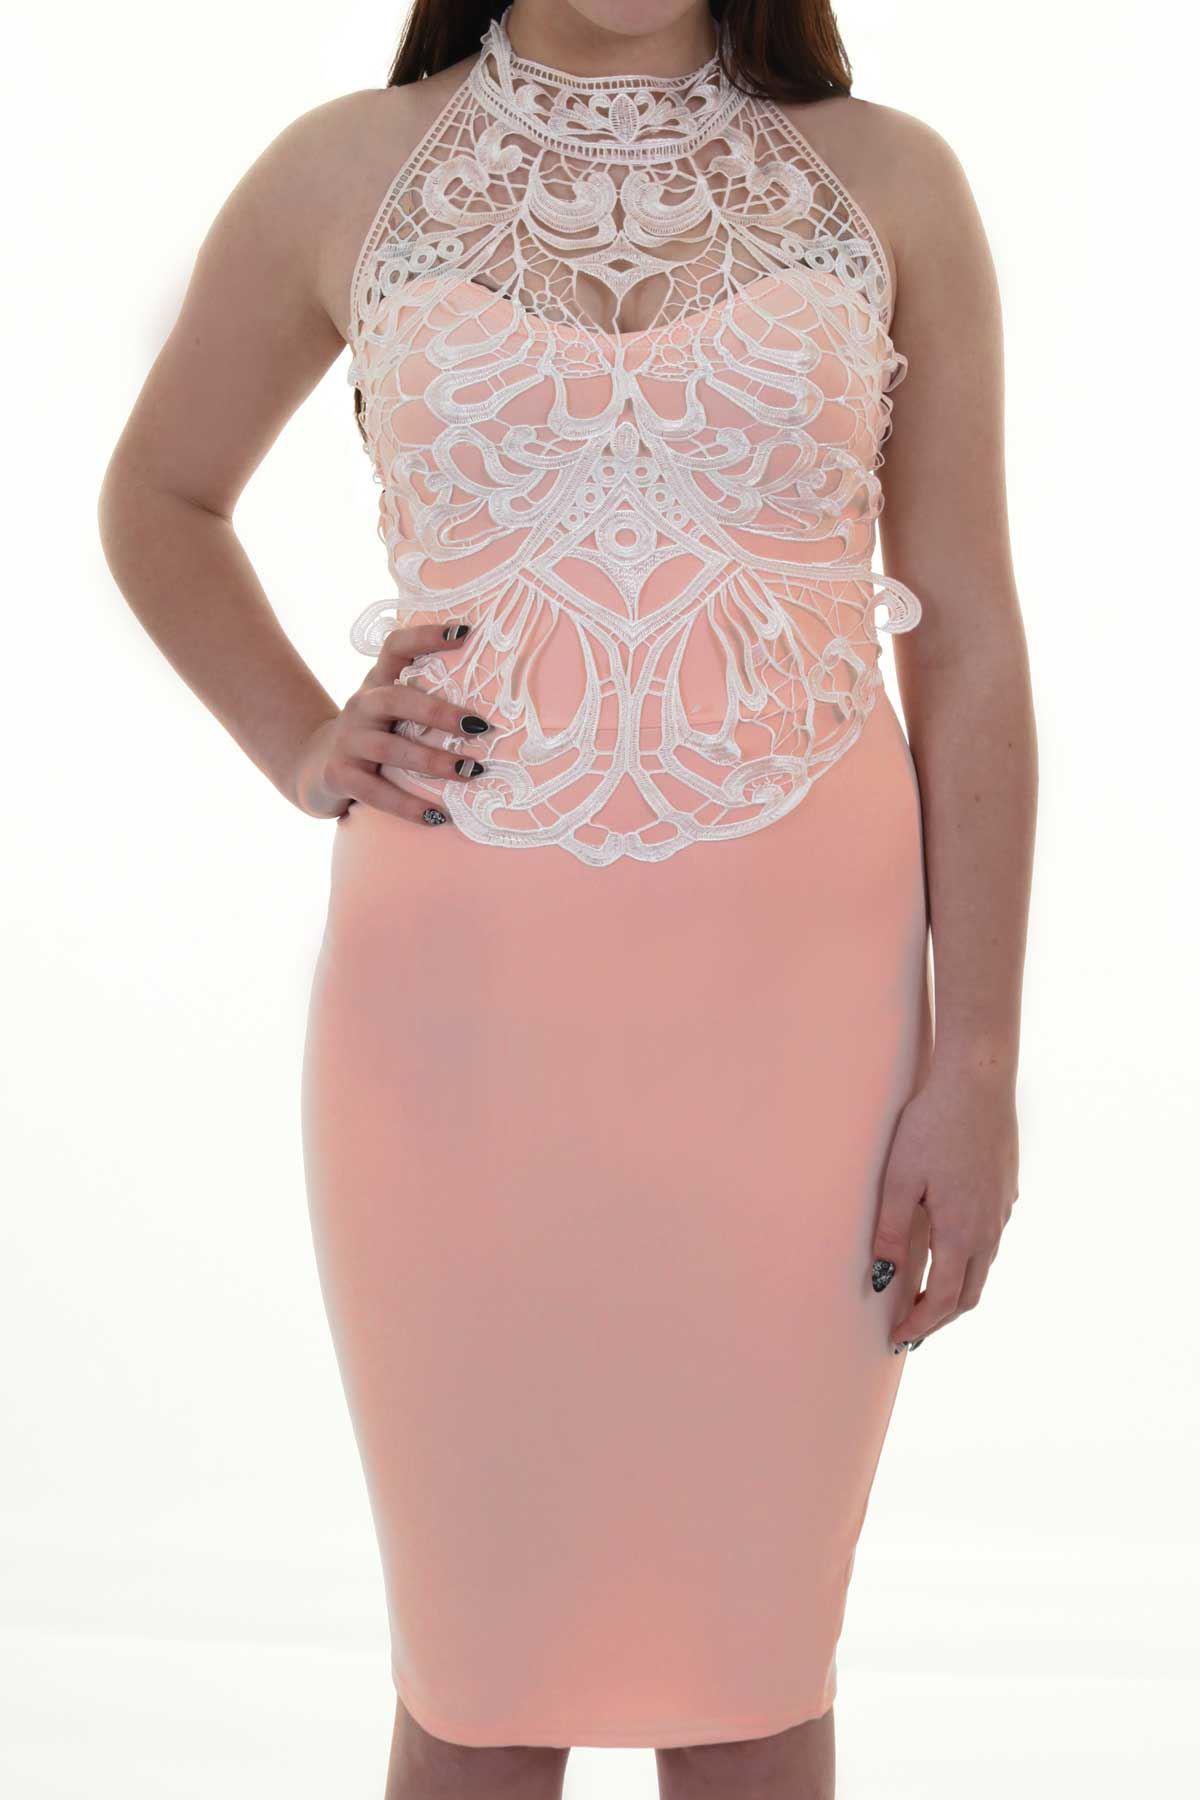 Ladies High Neck Tie Back Lace Crochet Women/'s Party Pencil Bodycon Dress